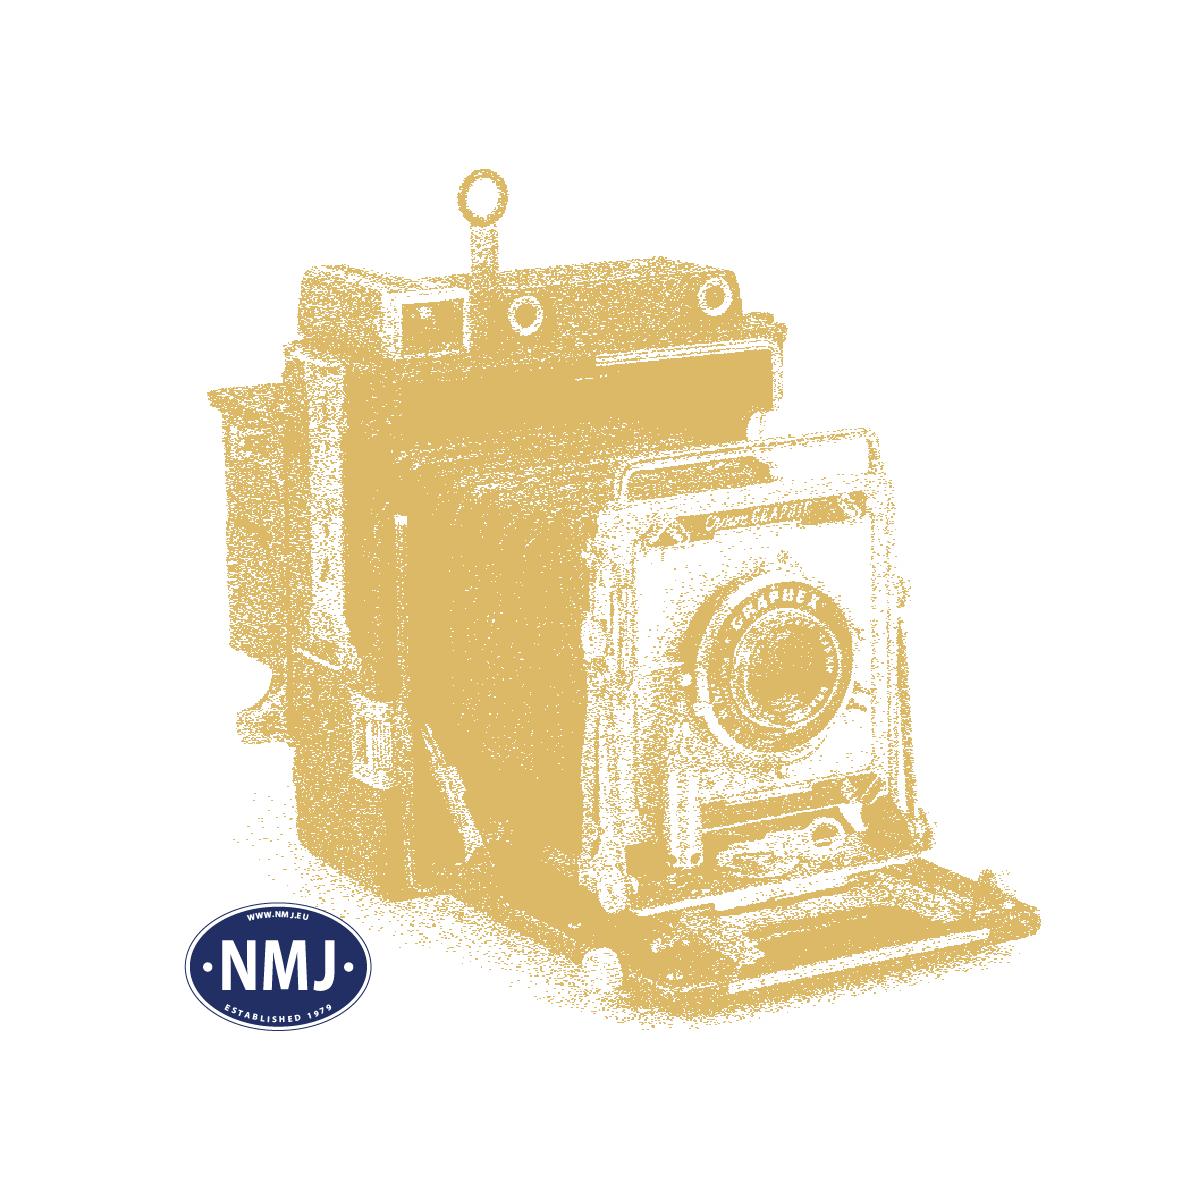 NMJT145005 - NMJ Topline NSB Di3.602, Rot/Schwarz mit GM Logo, DC Analog, Spür 0